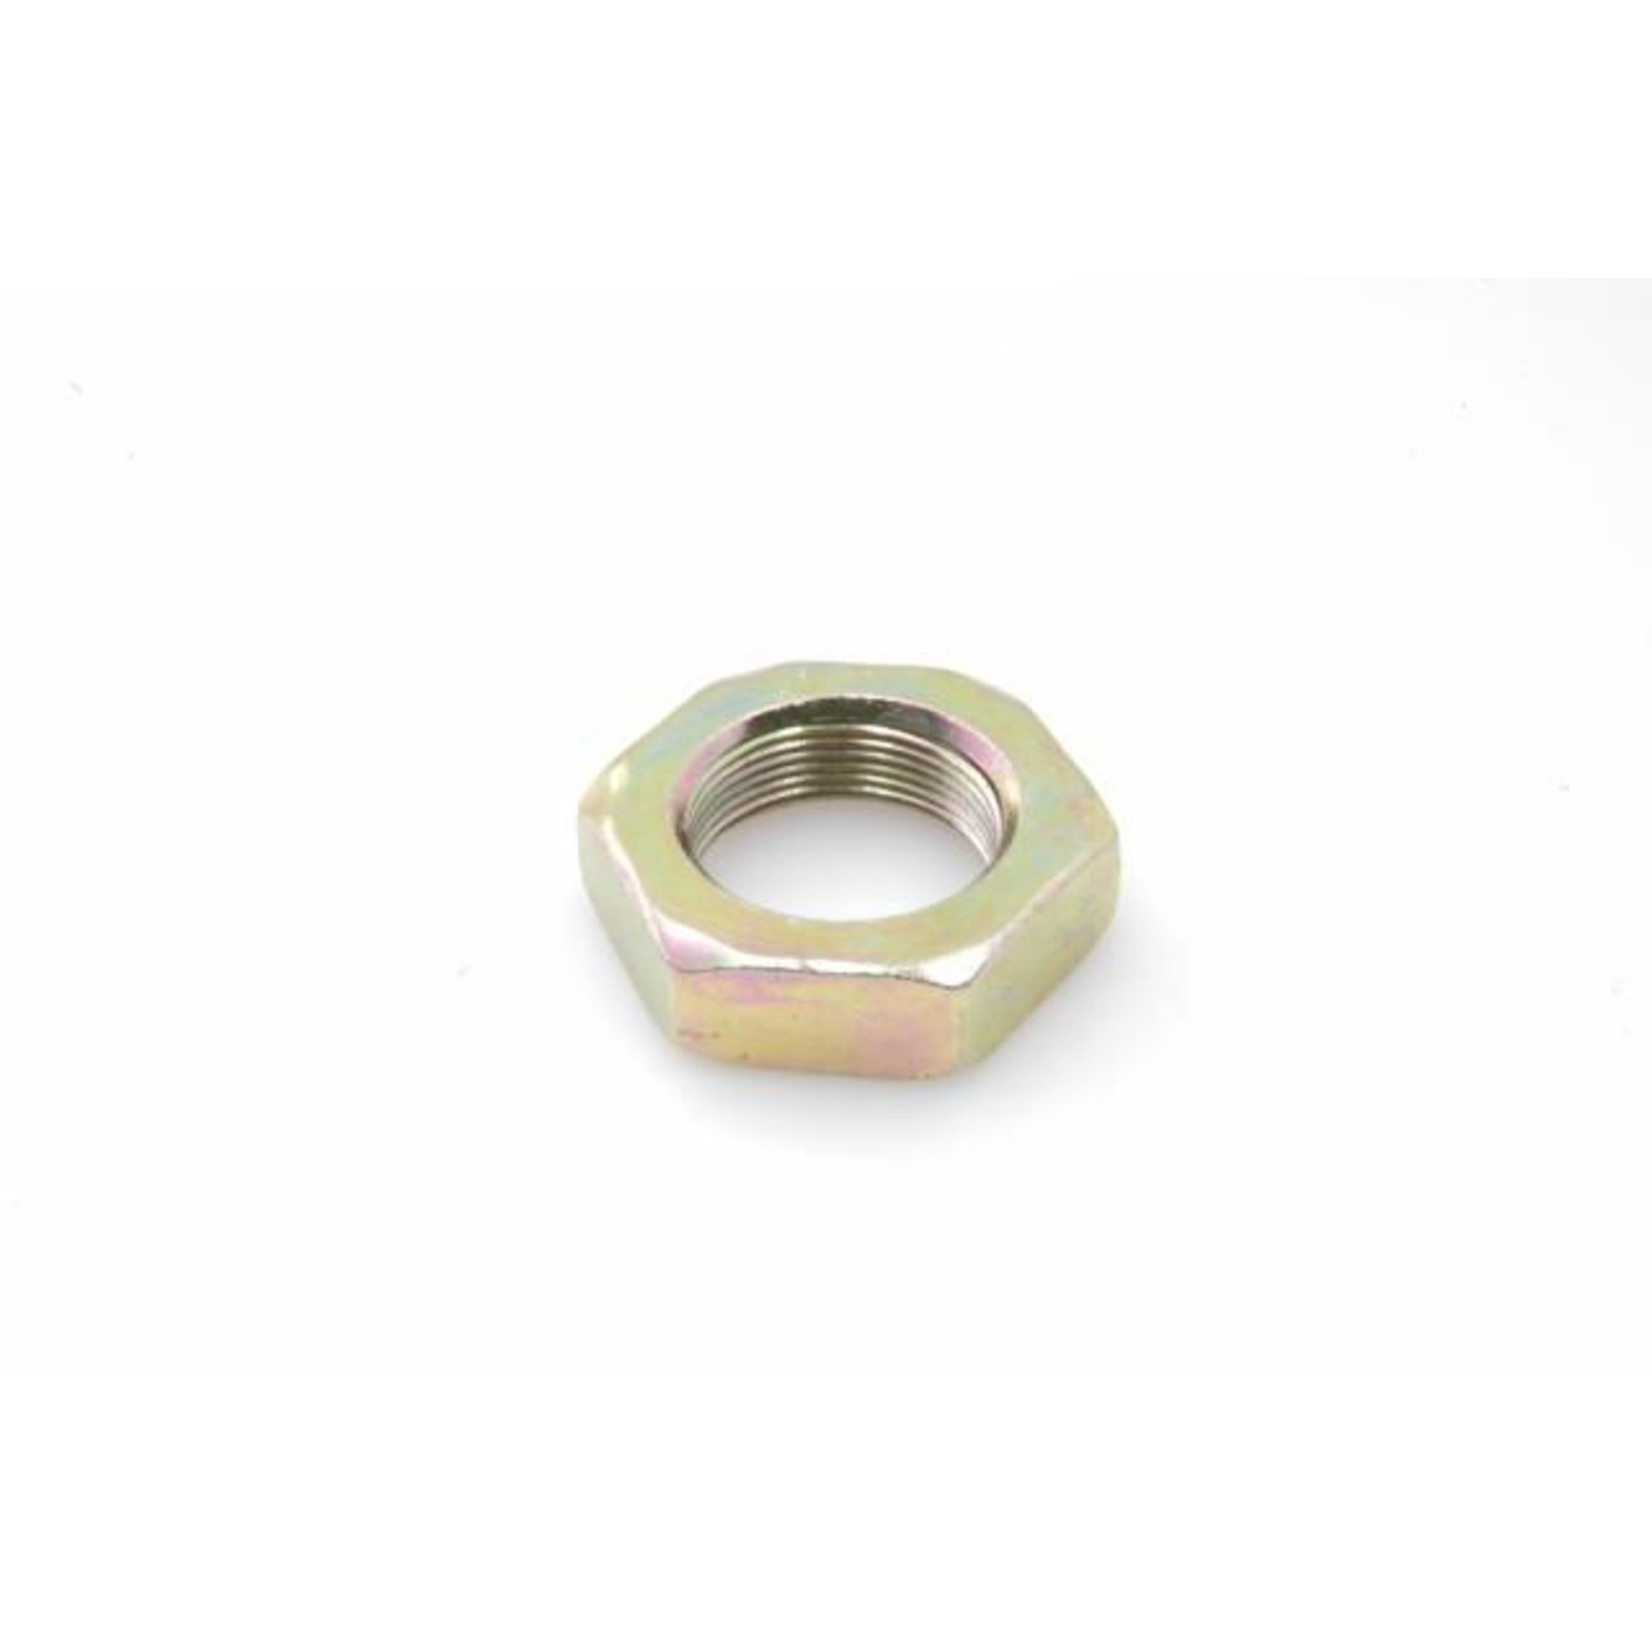 Nut adjustable bracket rear bumper Nr Org: ZC9614203